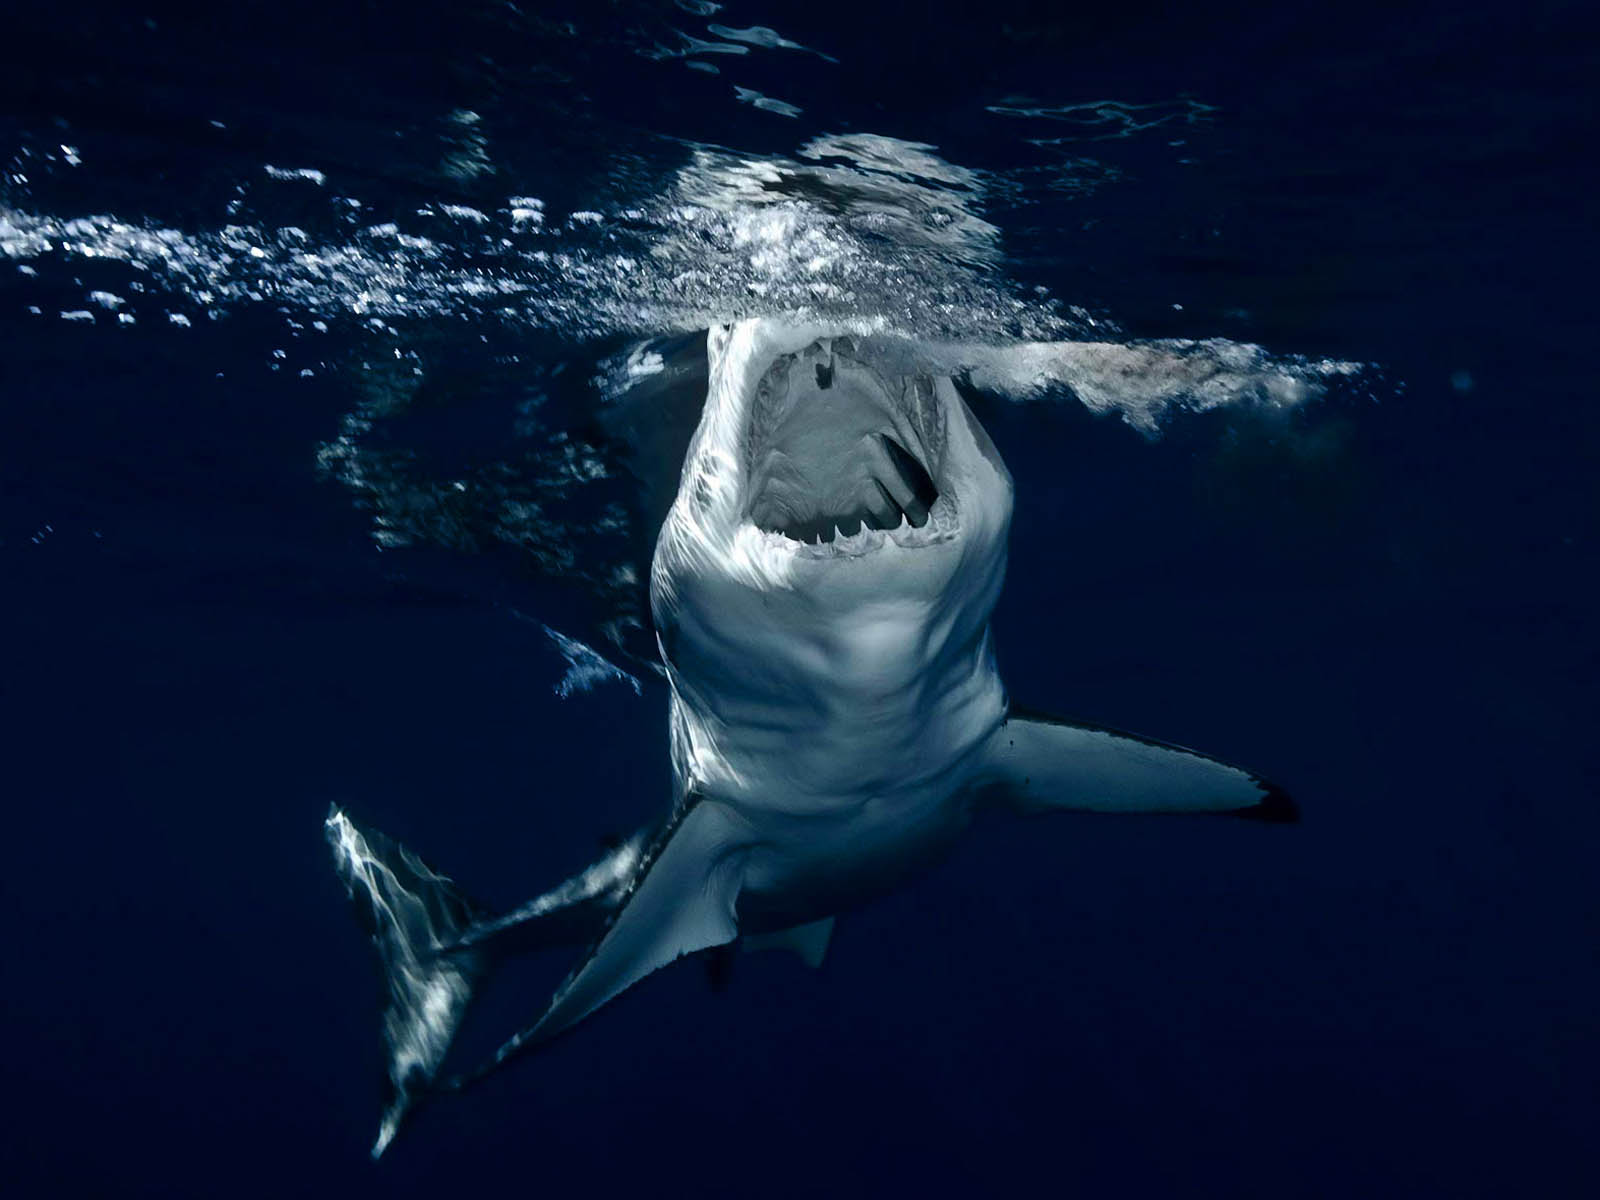 download shark wallpapers wallpaper - photo #3